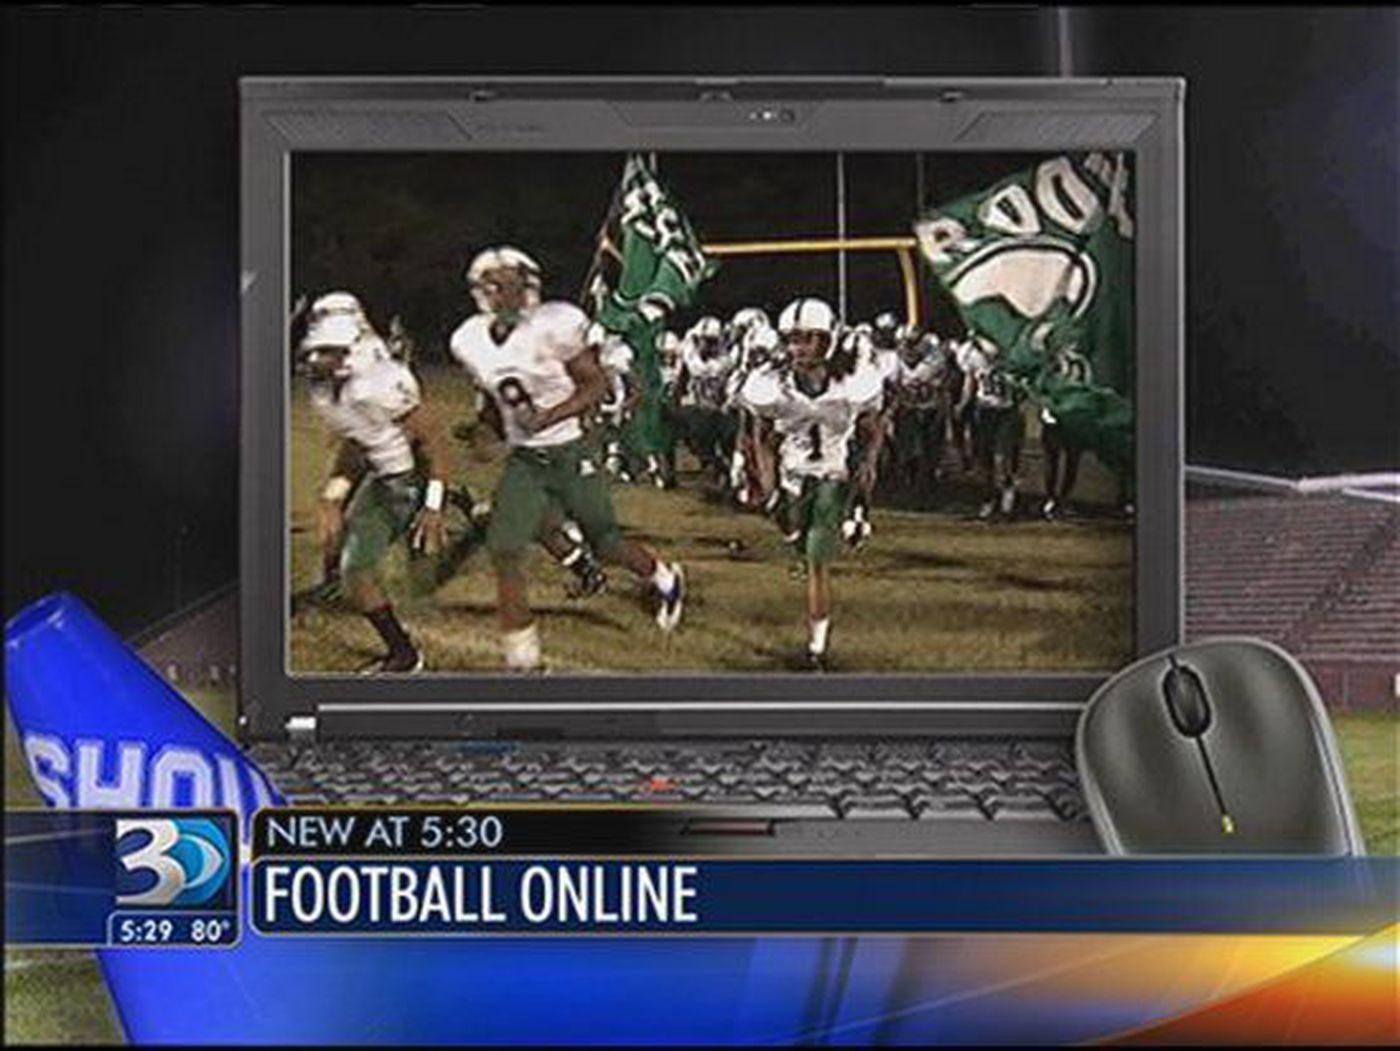 Gaston Co Schools Allowing Live Streaming Of Footballis Tv Next